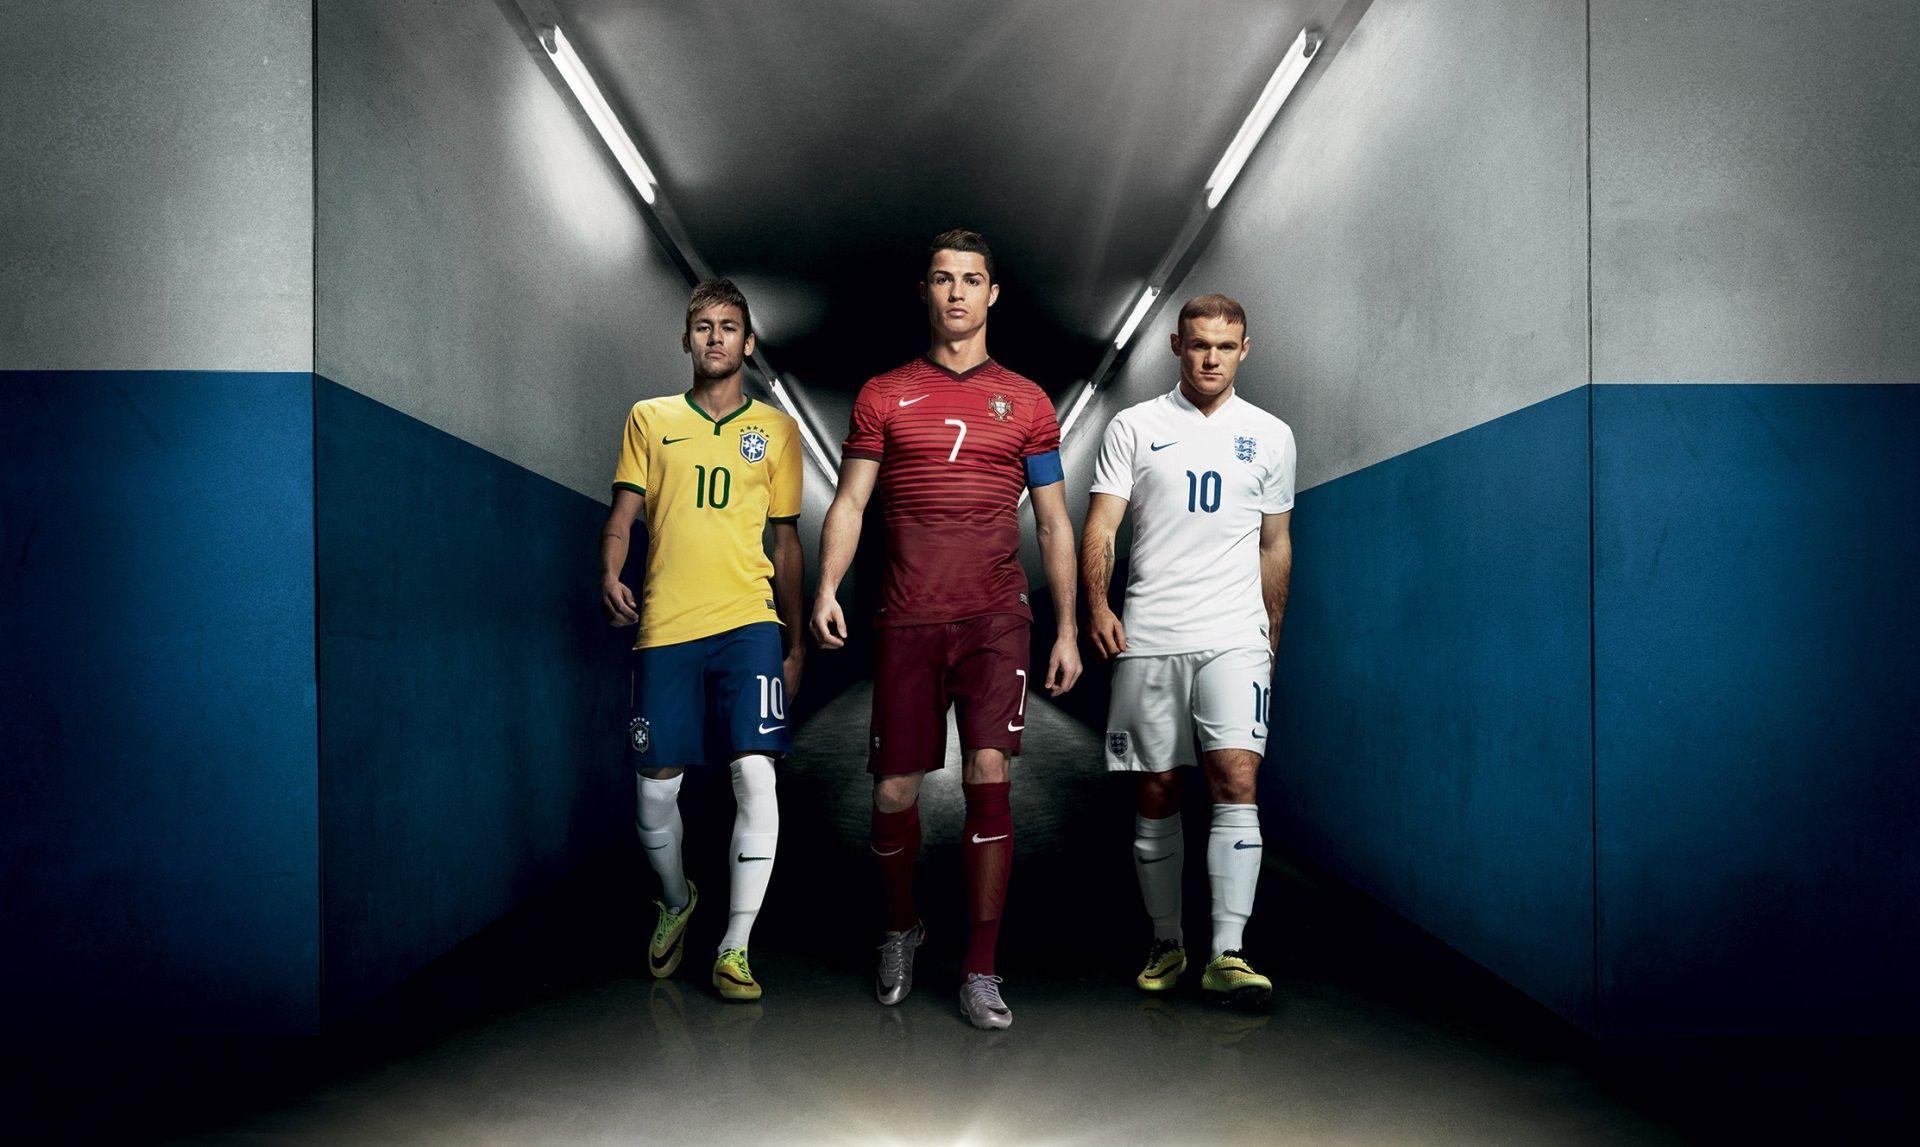 Nike Football | Risk Everything feat. Cristiano Ronaldo, Neymar & Wayne Rooney